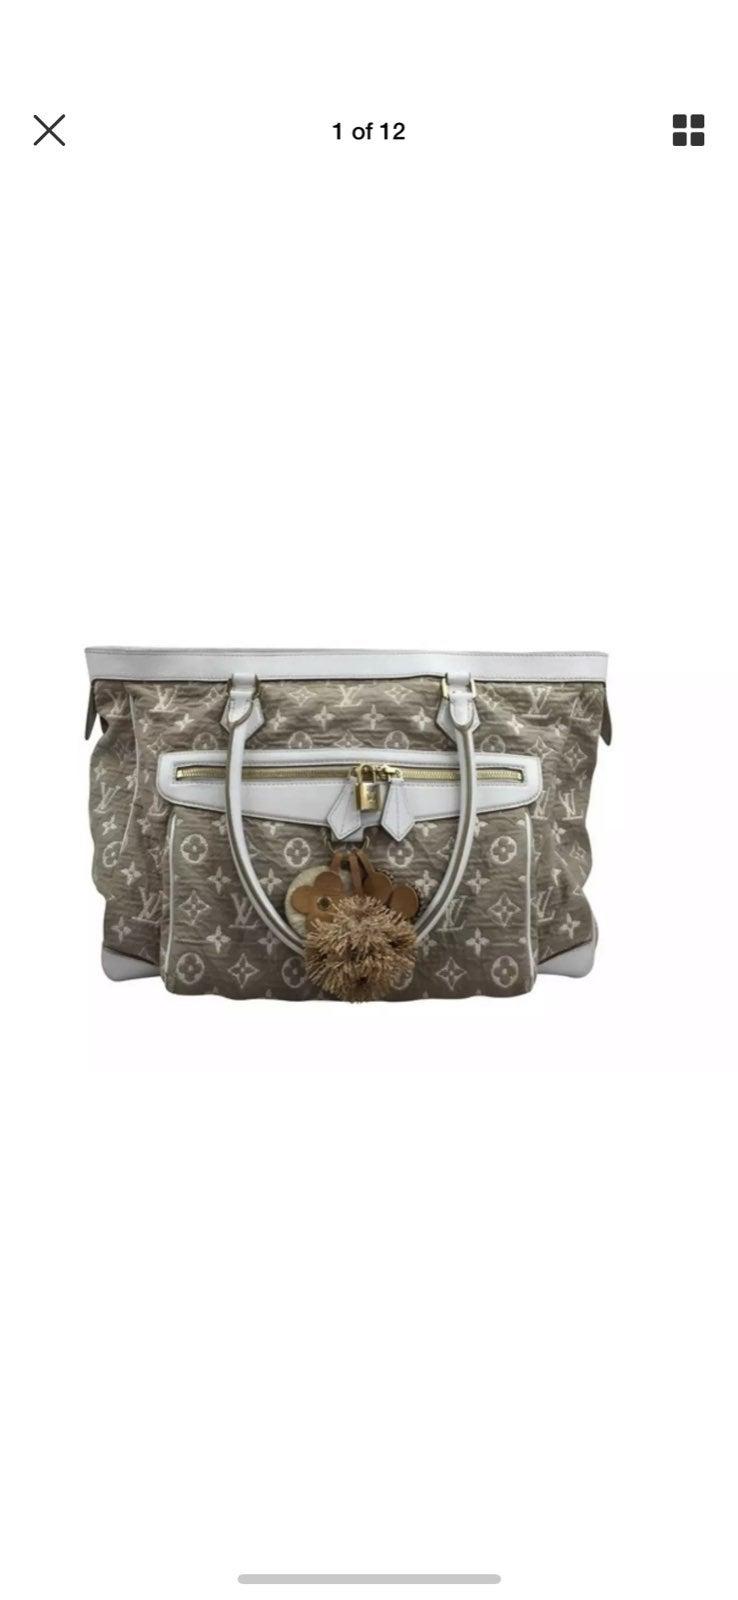 Louis Vuitton Jacquard Tote Purse Bag